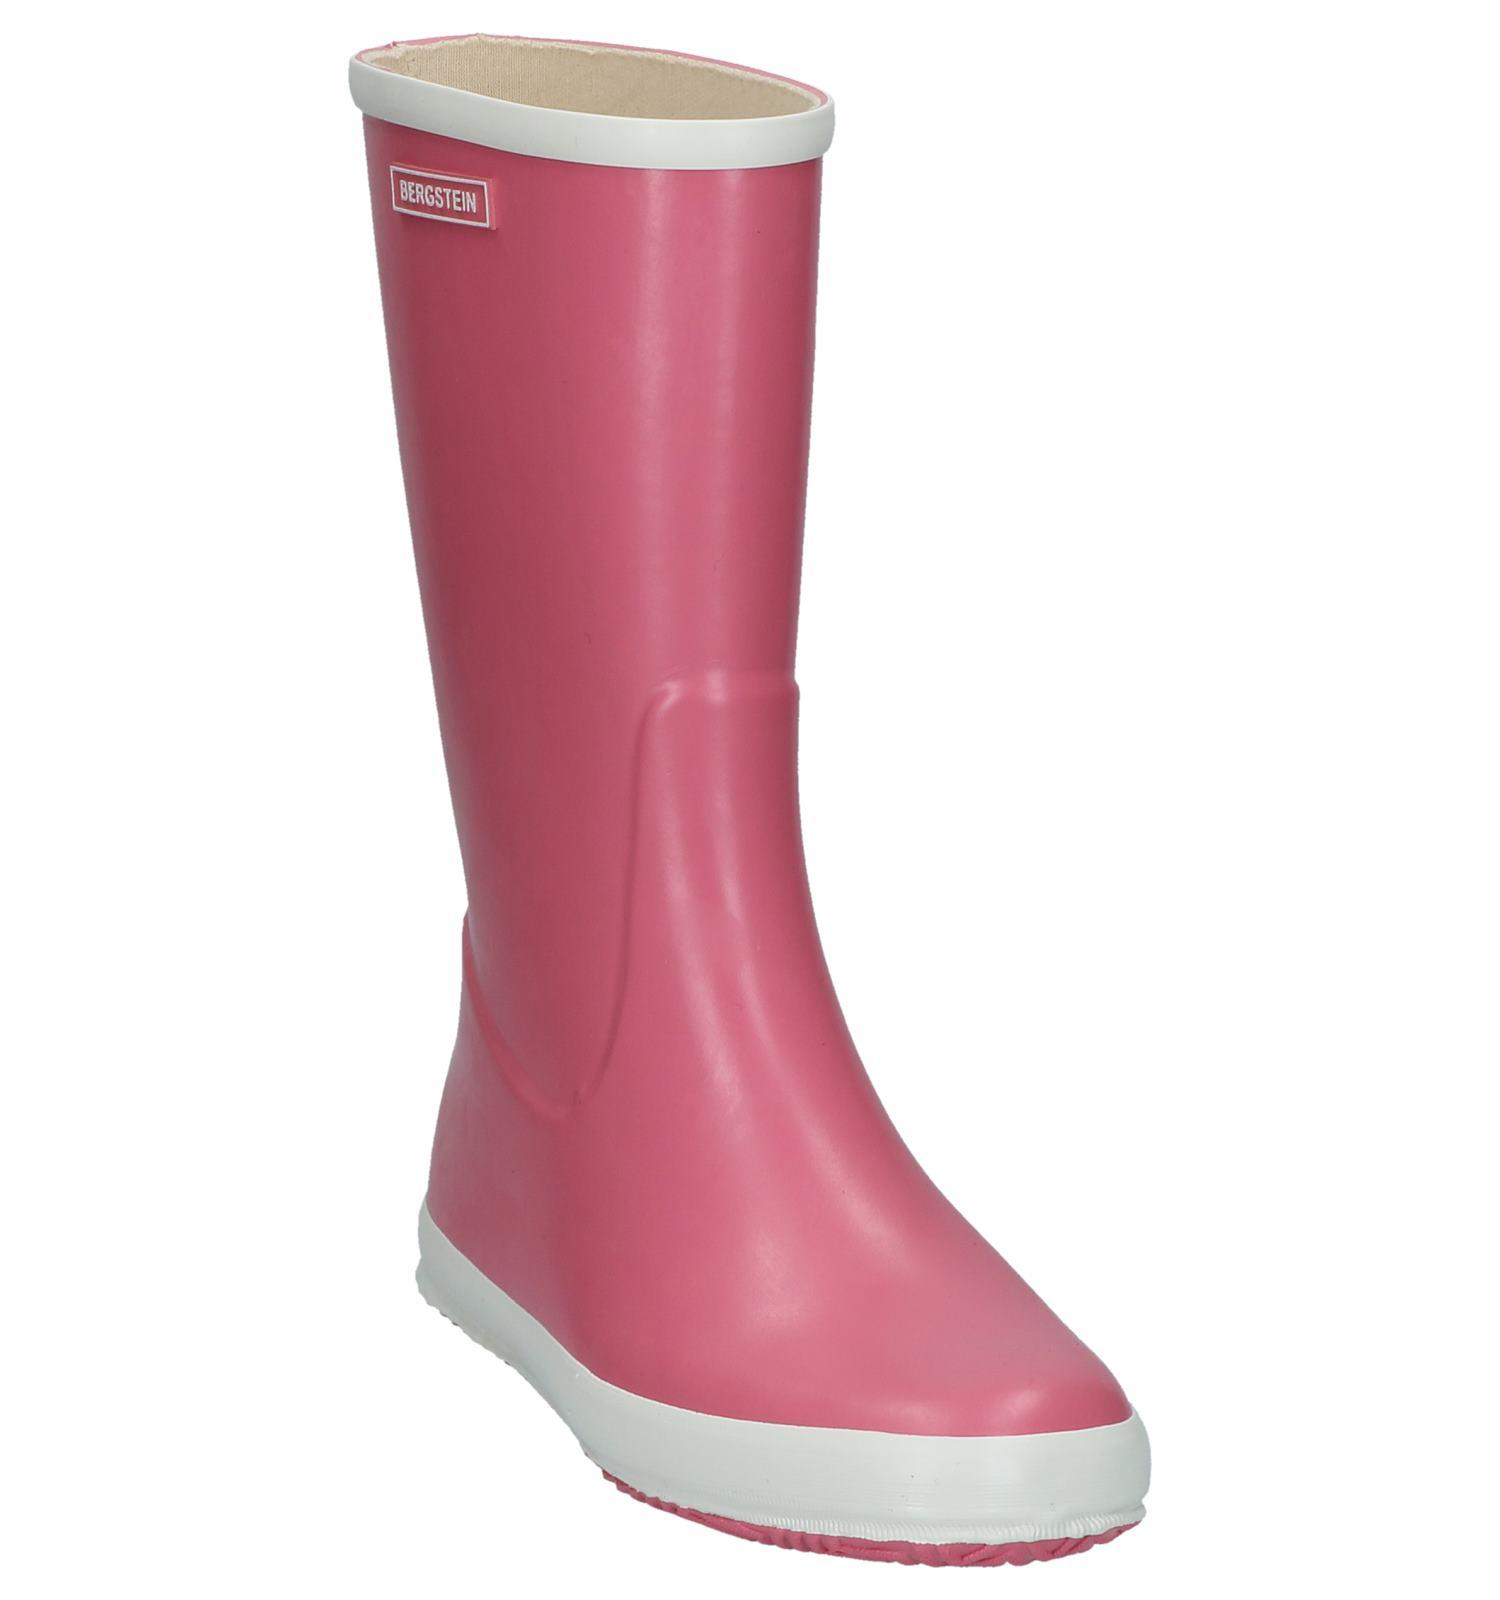 Bergstein Rainboot Roze Bn Wmn Regenlaarzen XTPklOwuZi